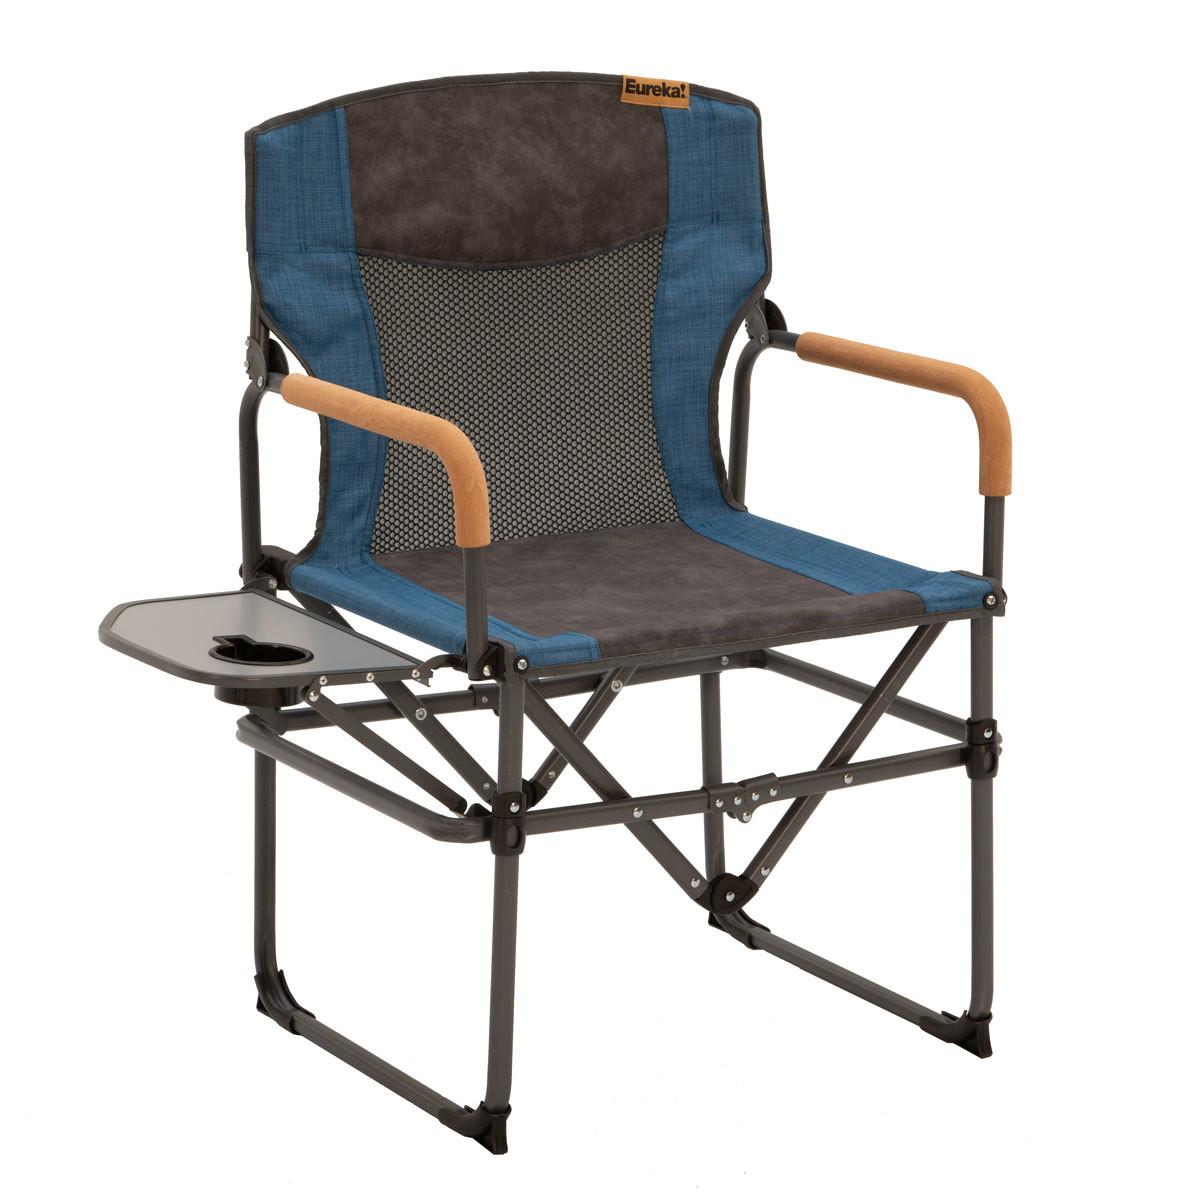 Eureka Director's Chair